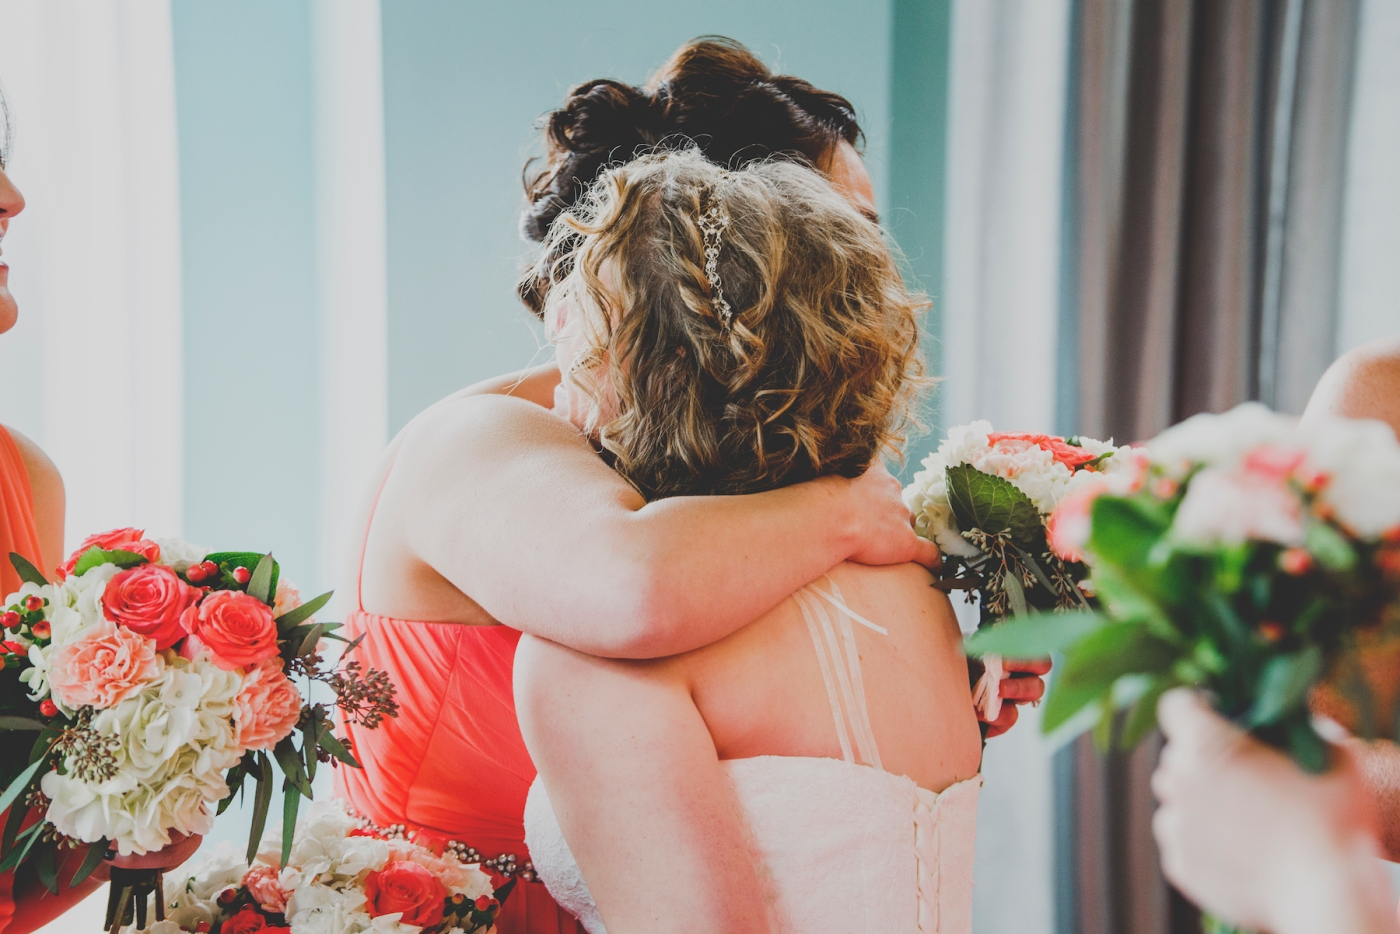 DSC_2485Everett_Wedding_Ballroom_Jane_Speleers_photography_Rachel_and_Edmund_Praying_2017